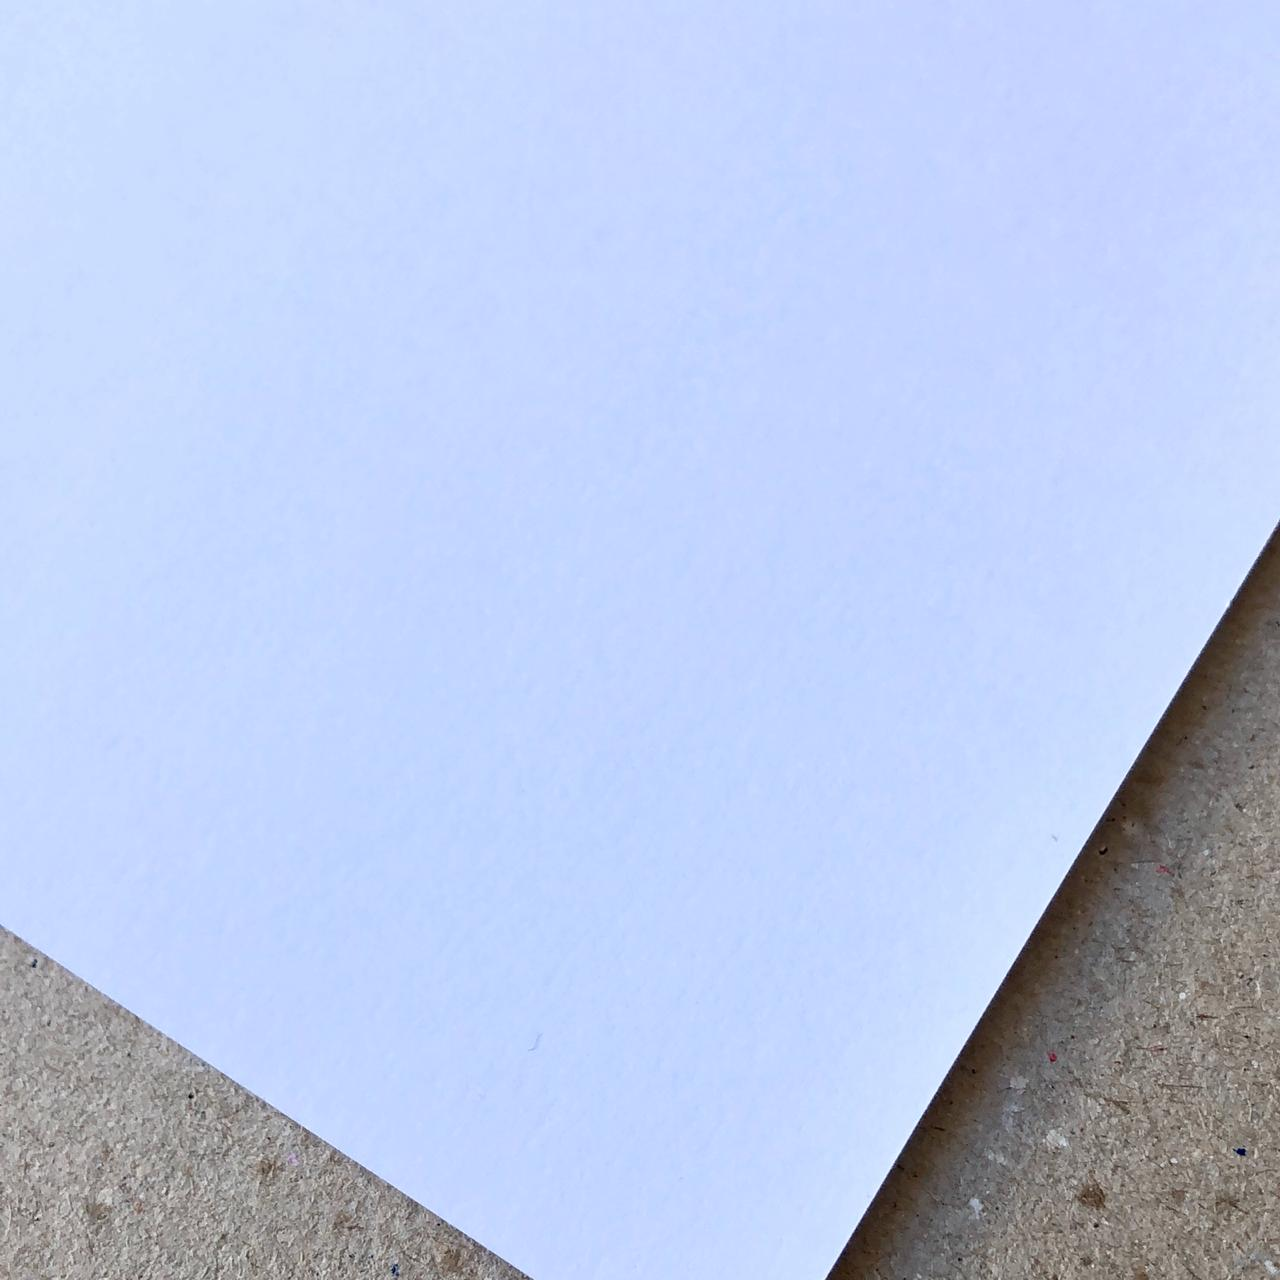 Papel Offset (Branco) 180g/m² - 30,5 x 30,5 cm (LISO-01)